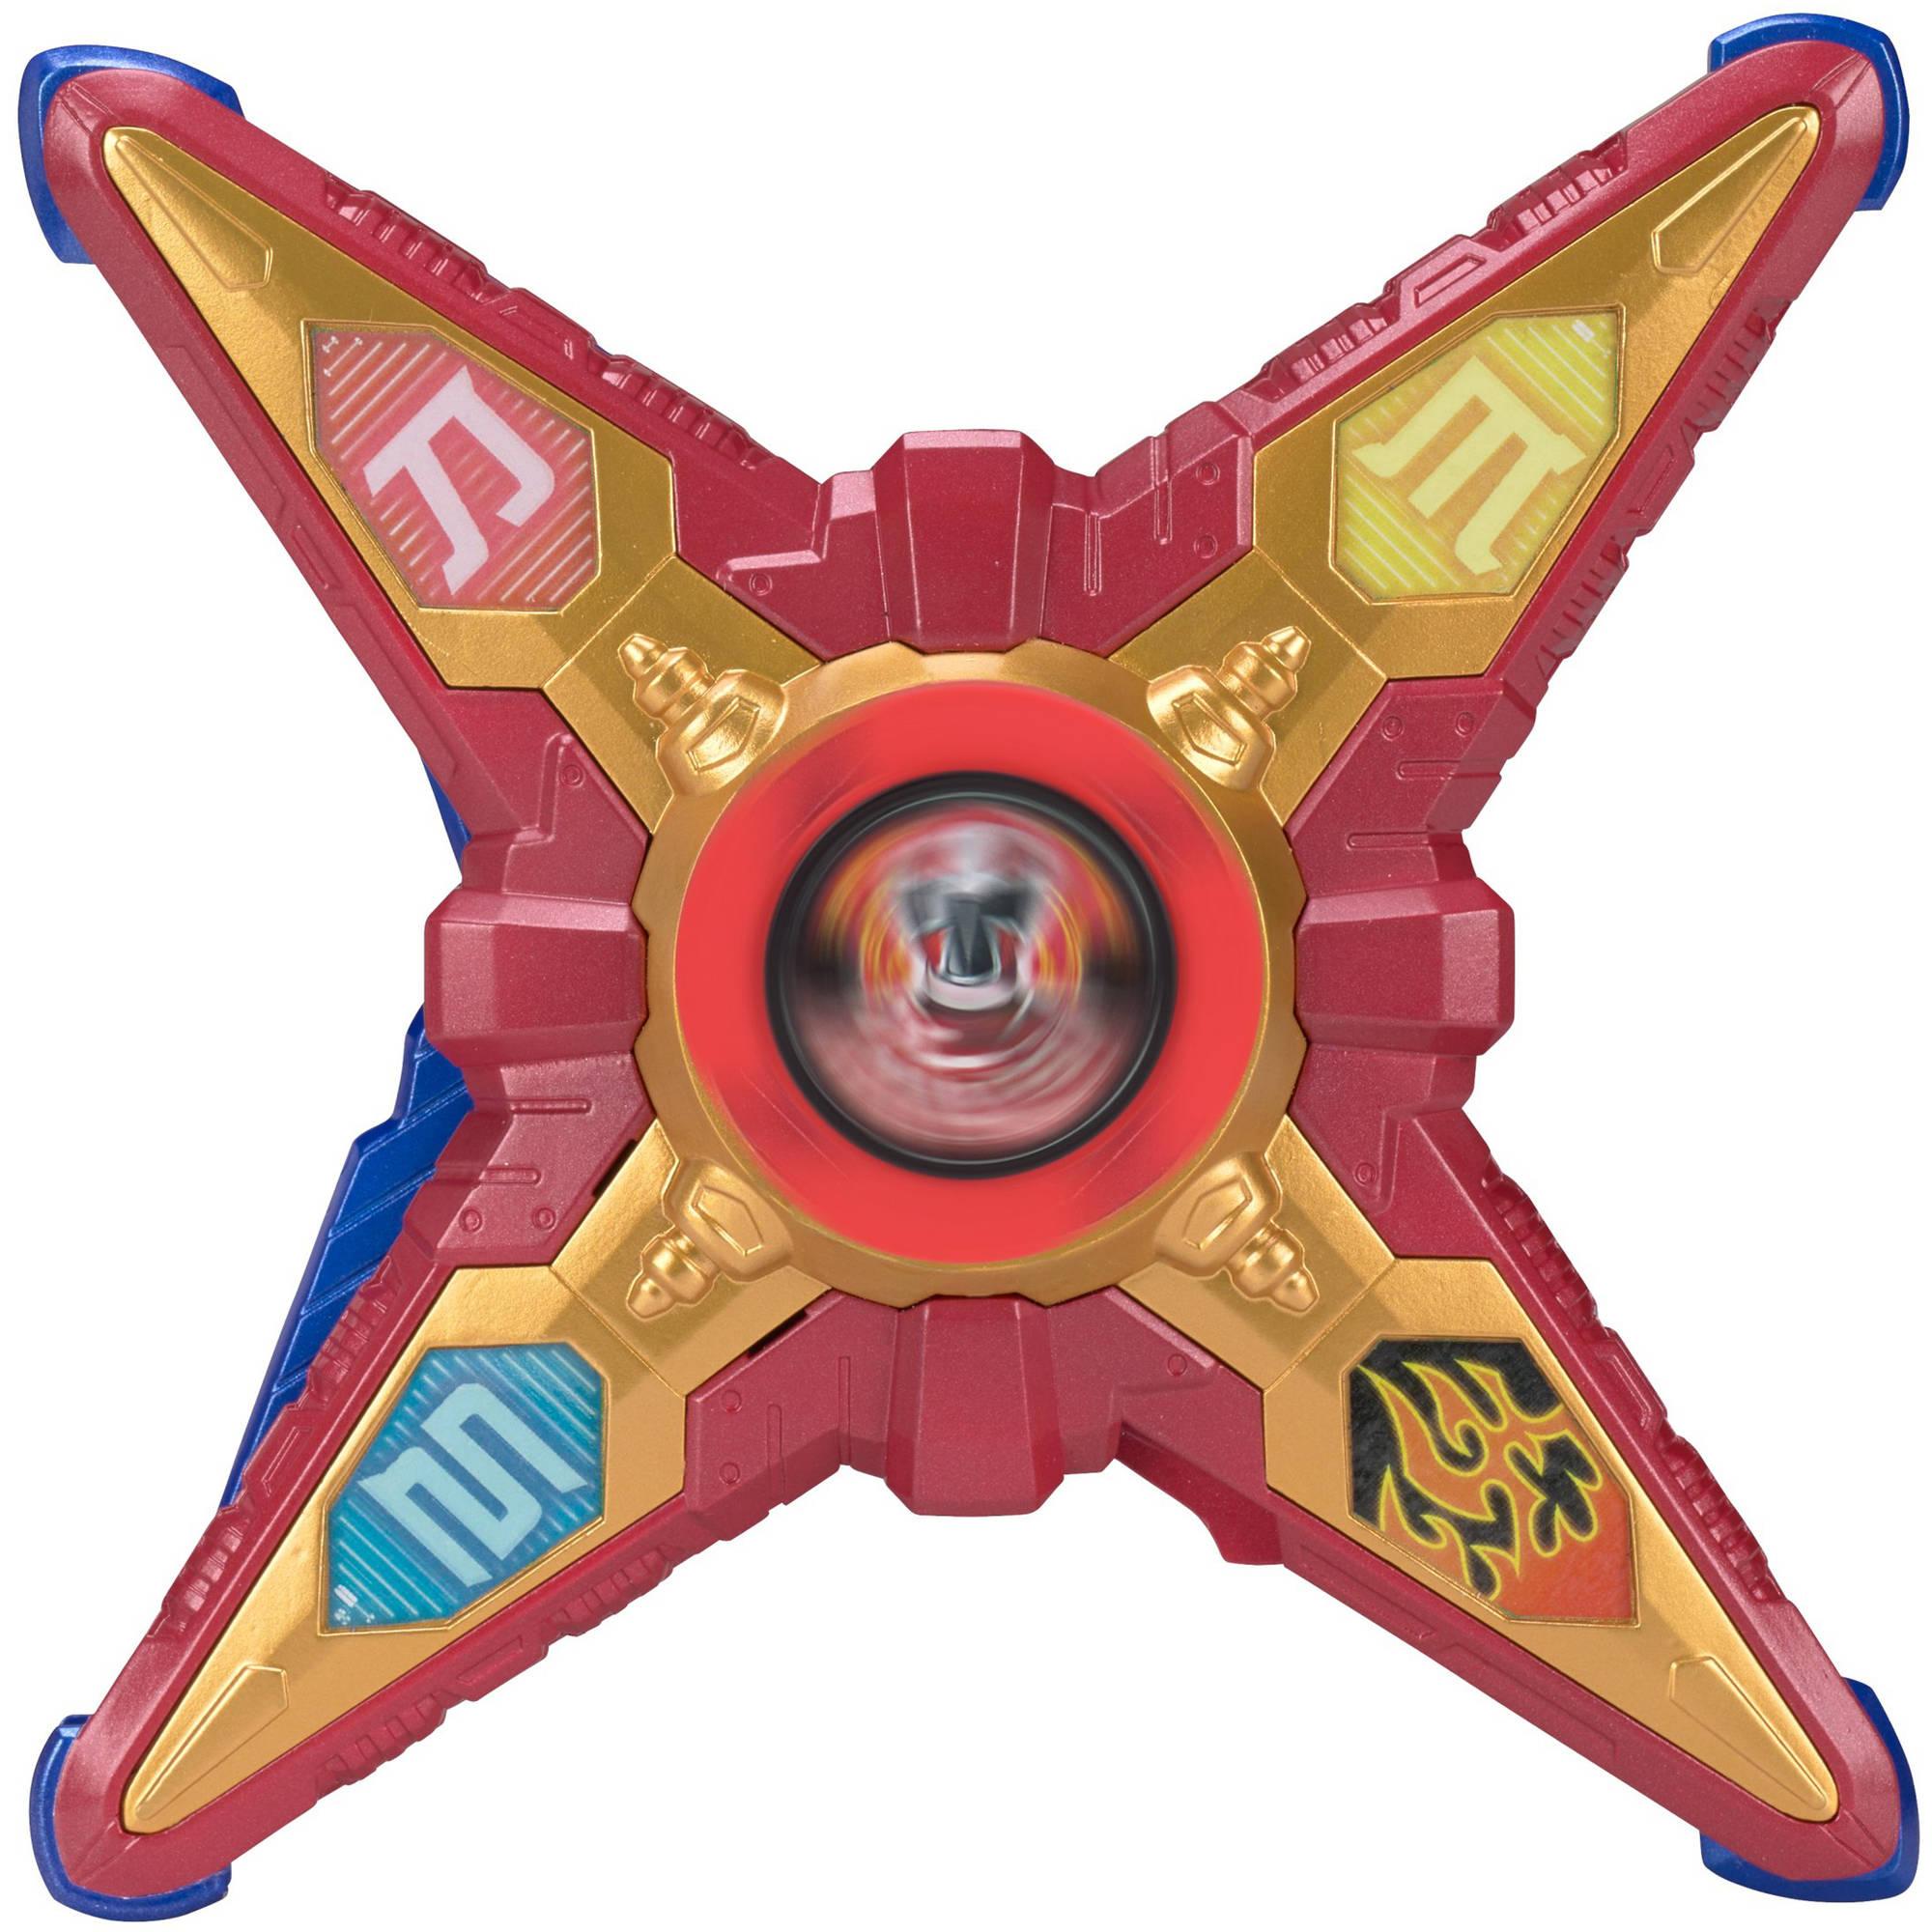 Power Rangers DX Morpher, Red